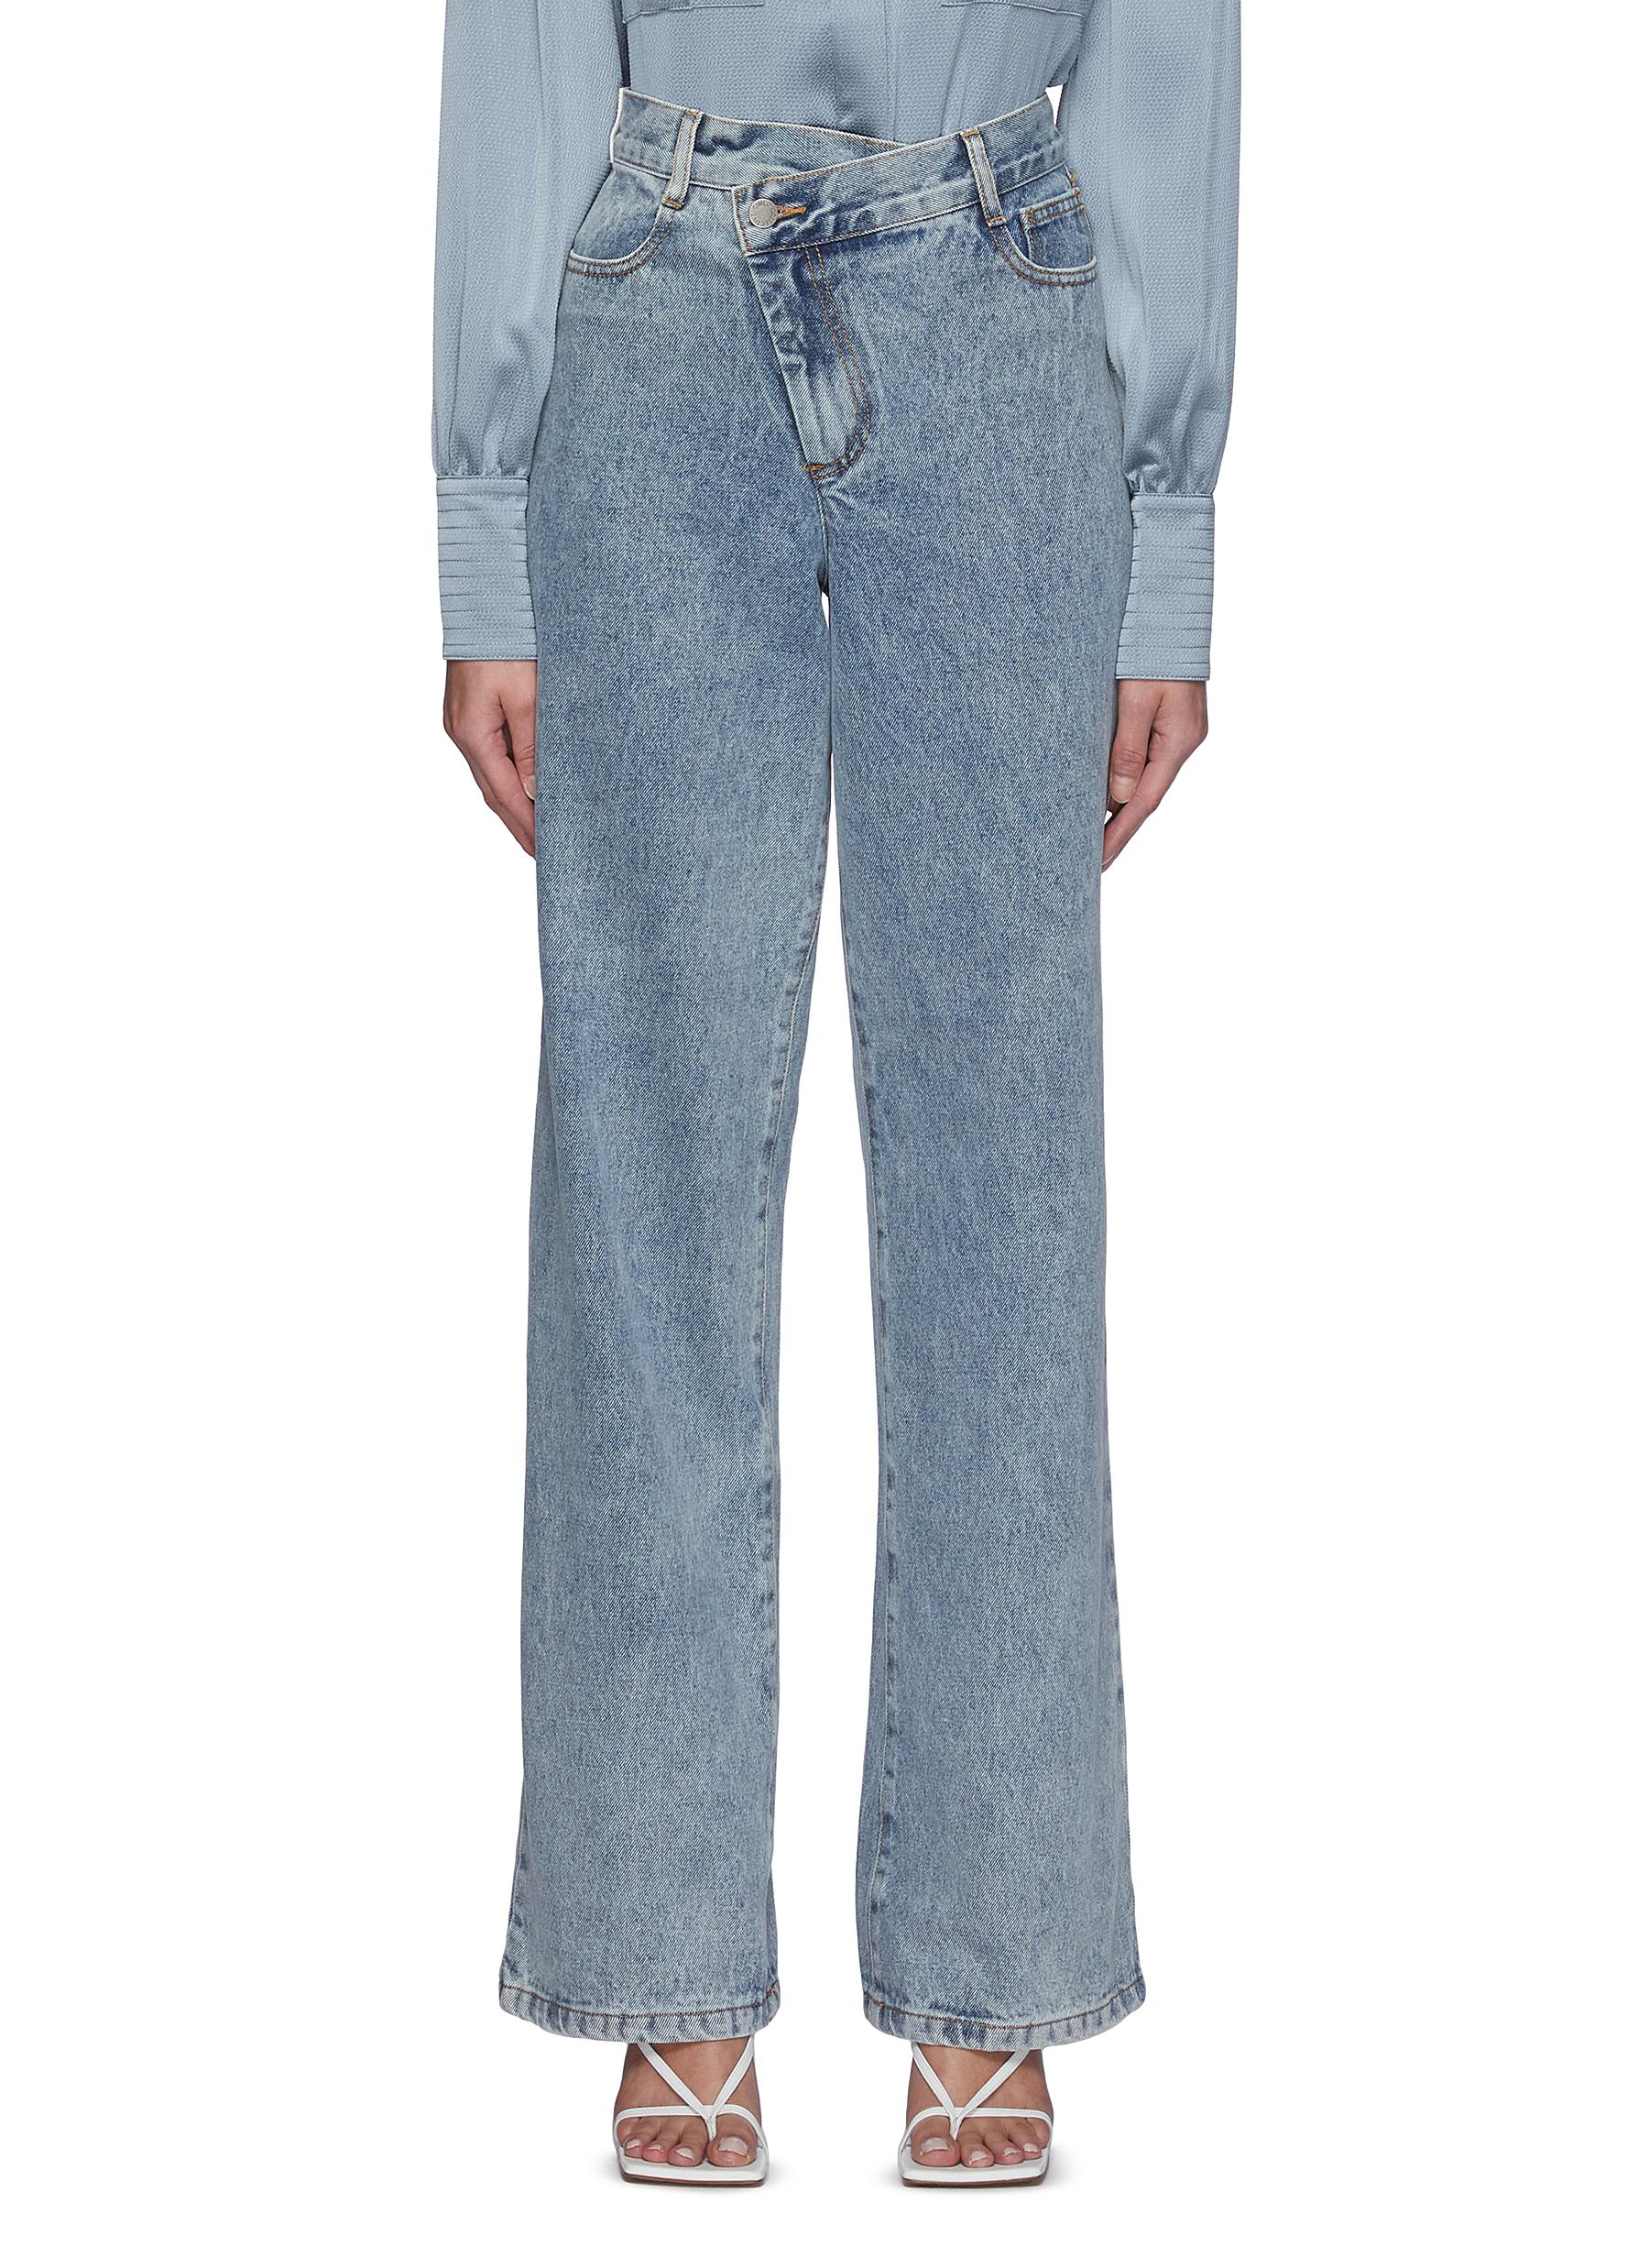 Heart Full' Wide Leg Jeans